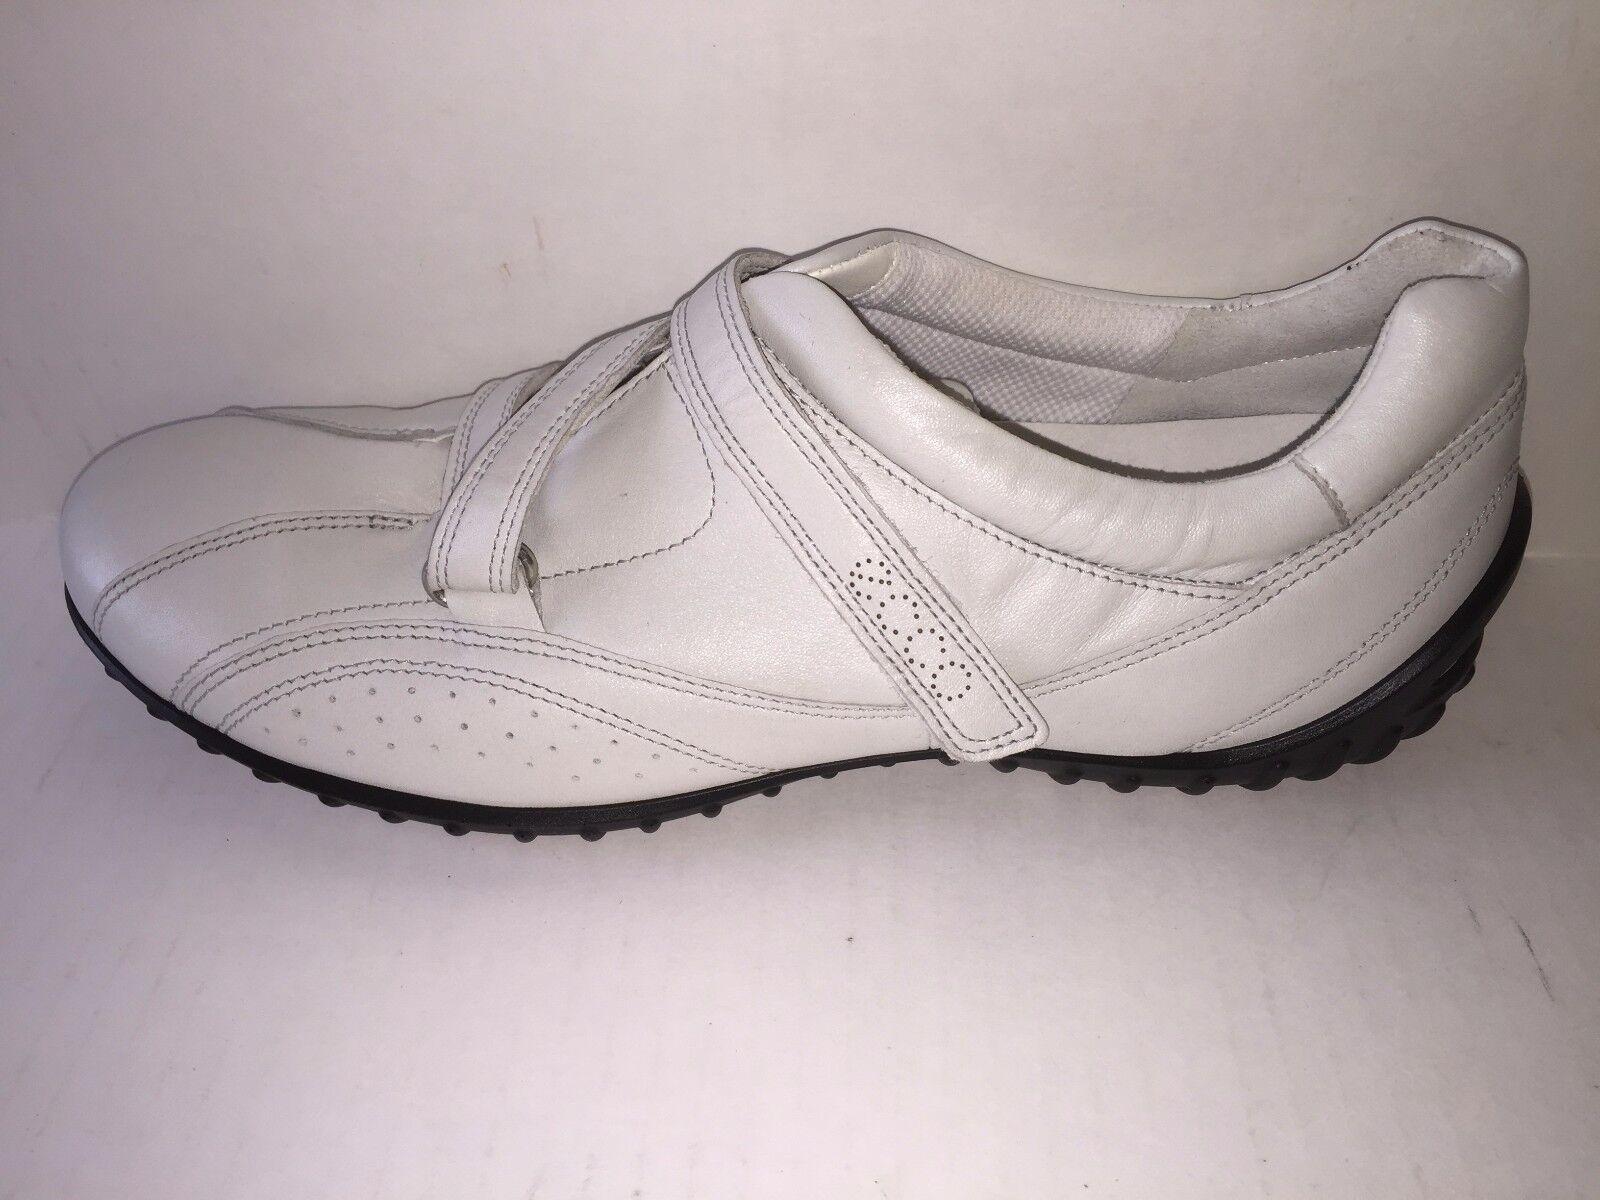 Ecco Donna  scarpe  CHarm Quick Fasatner bianca bianca bianca NEW in Box, Dimensione 10-10.5 1c0cd0